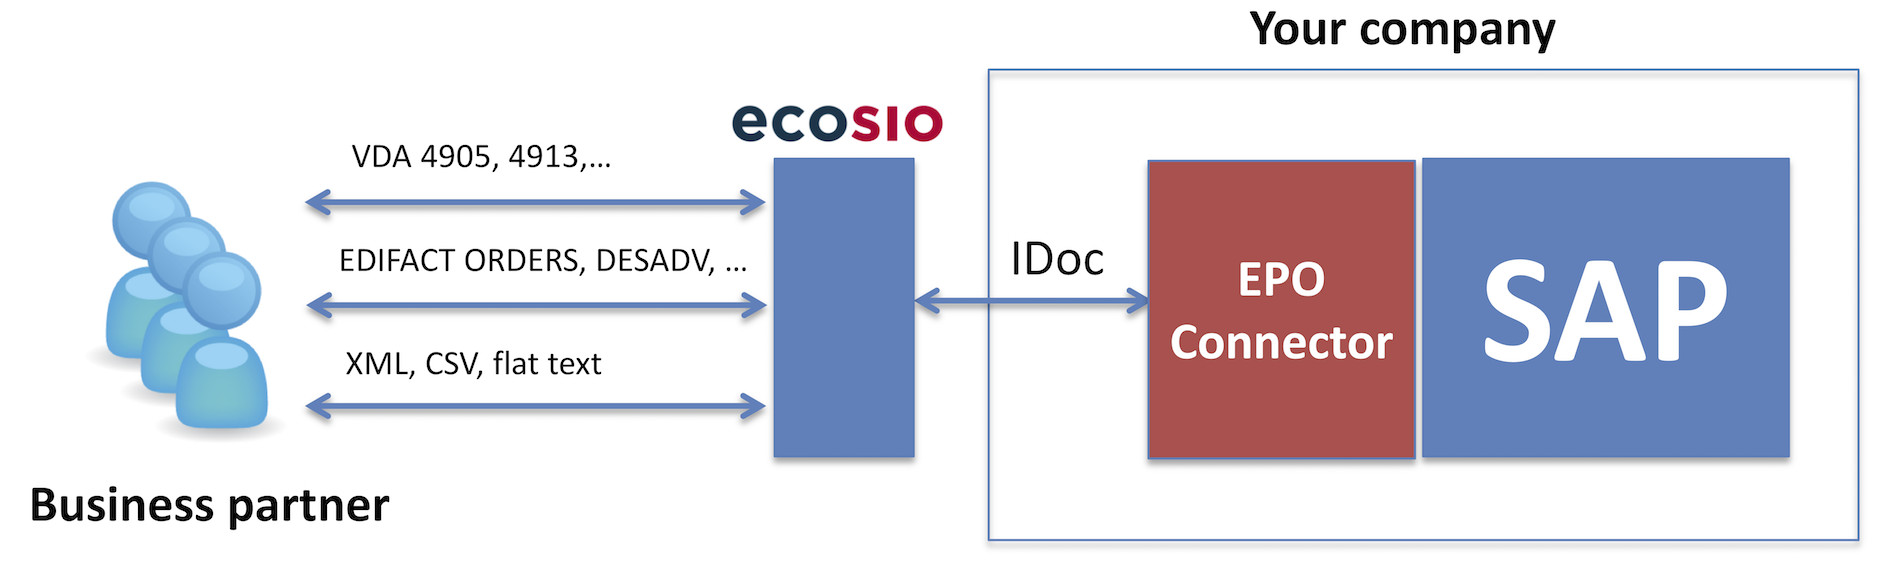 Electronic data exchange with ecosio and EPO connector